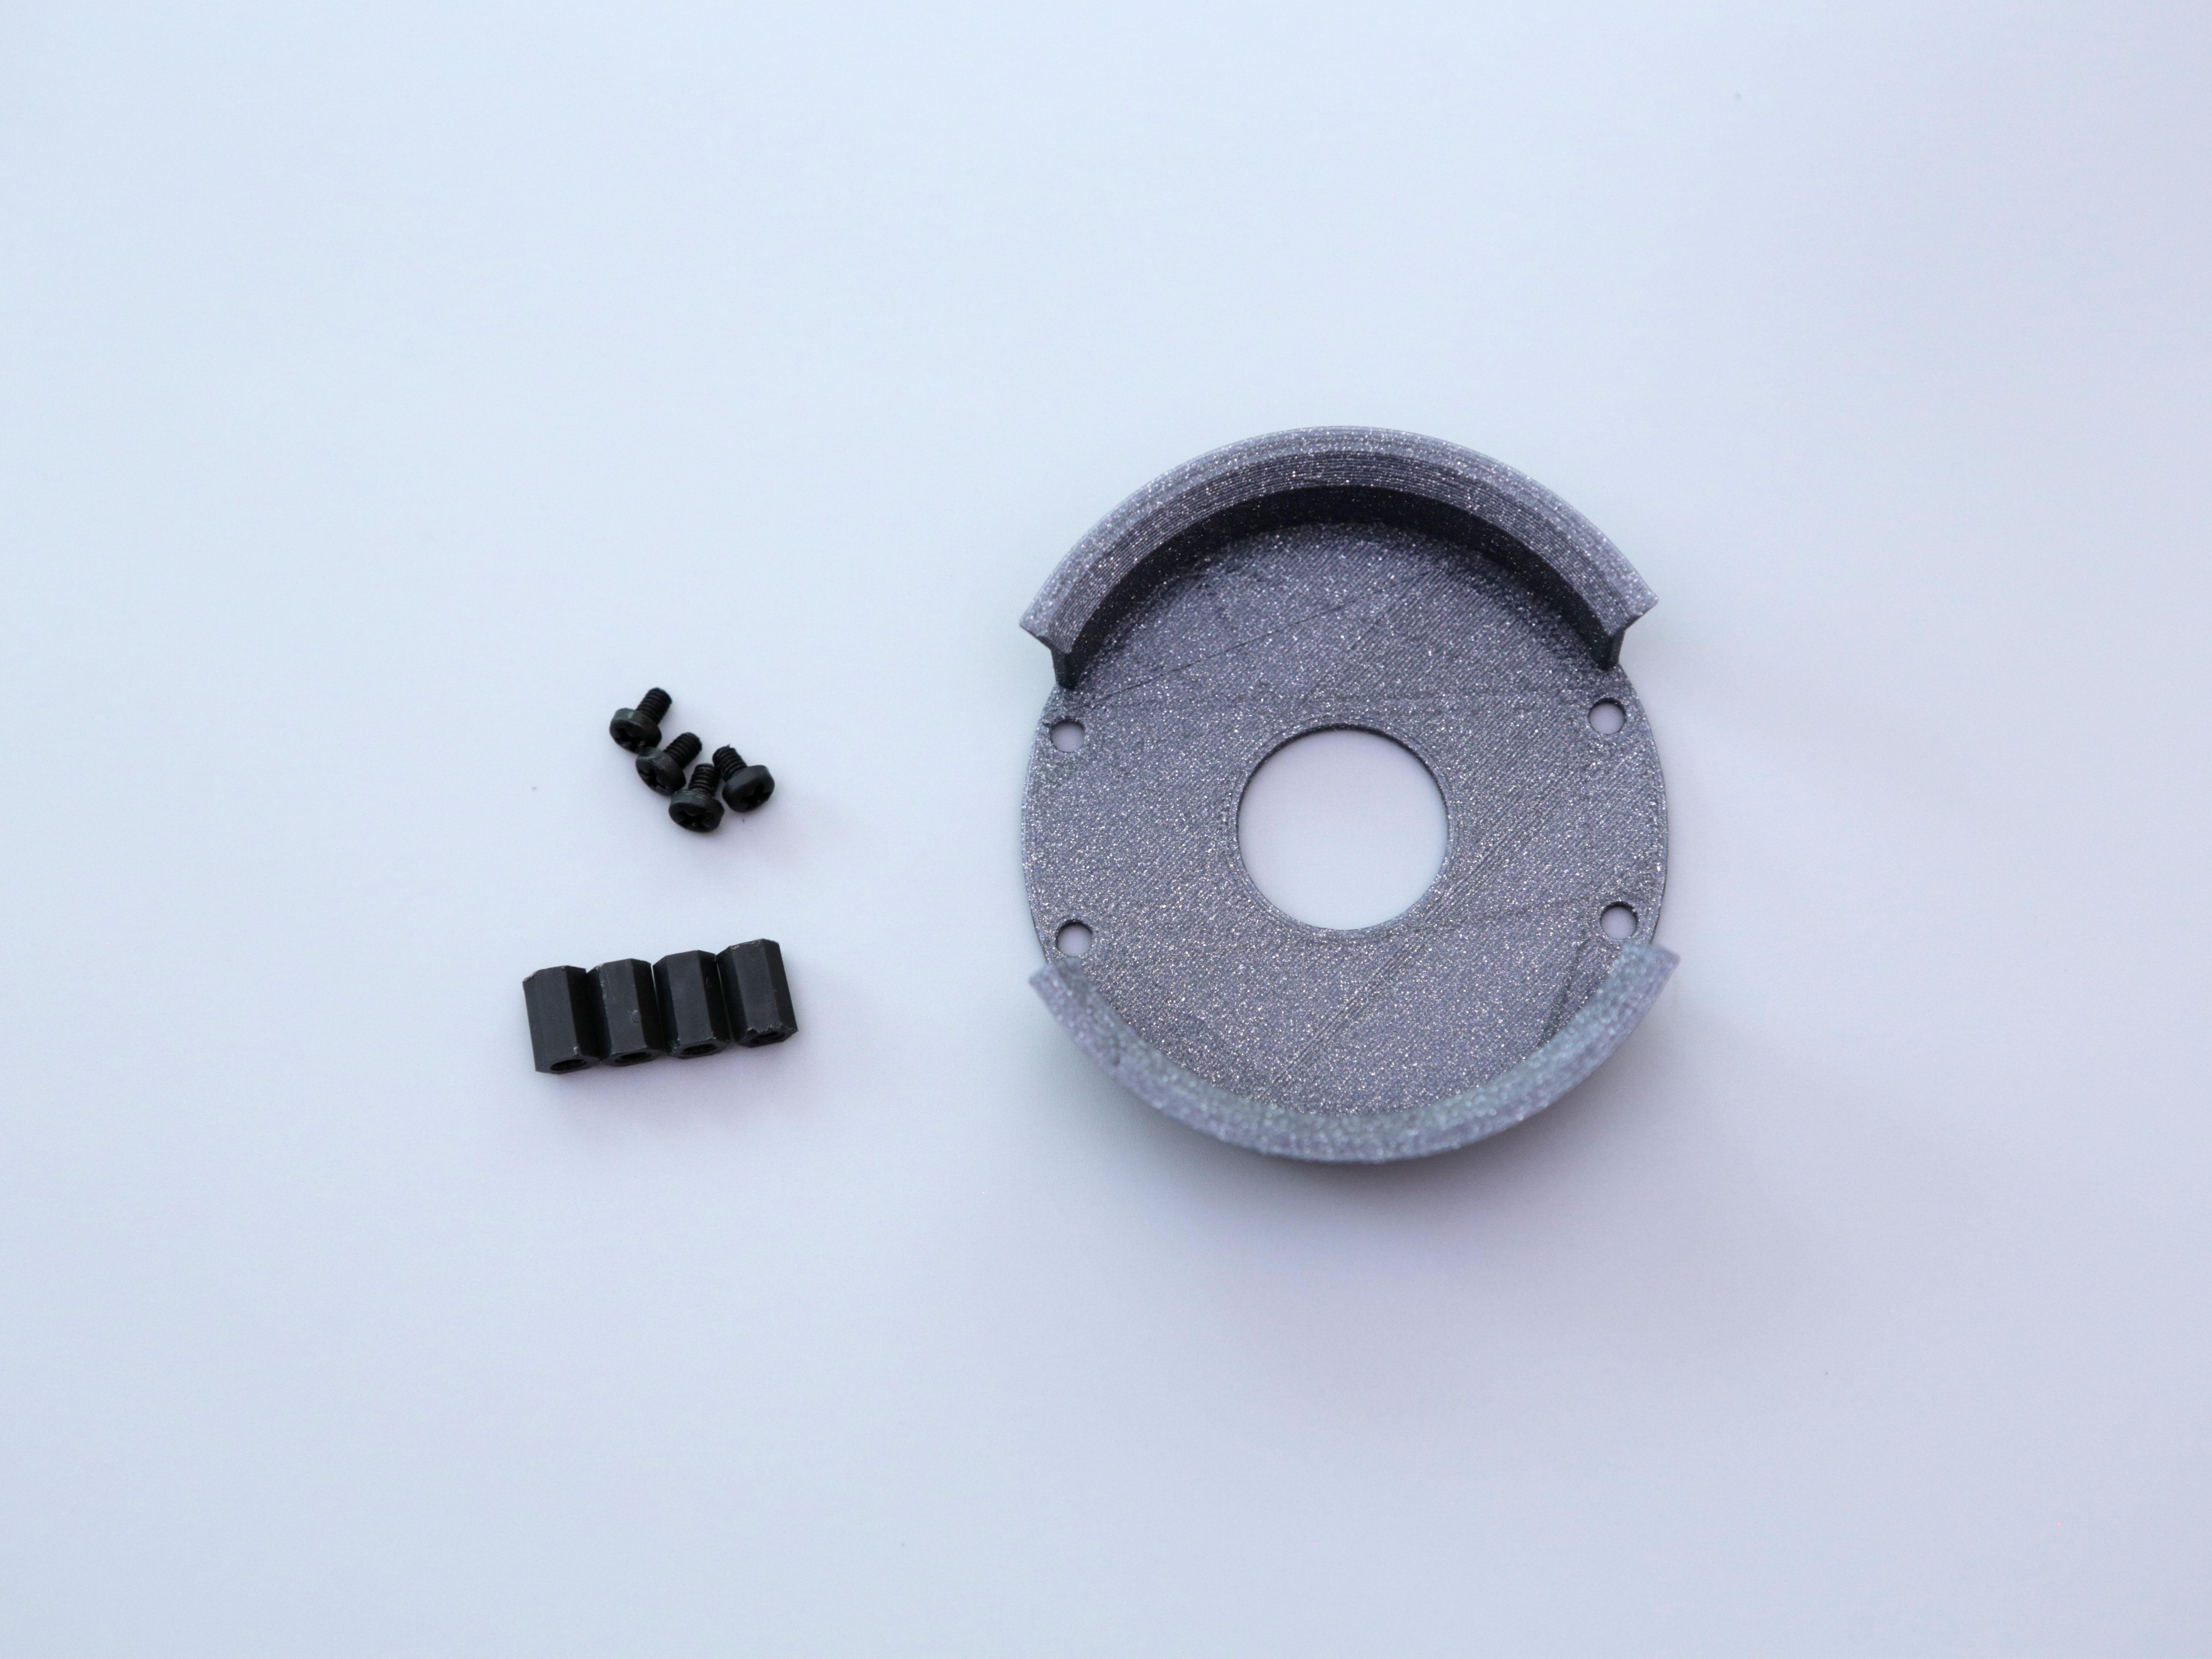 3d_printing_pcb-mount-screws.jpg